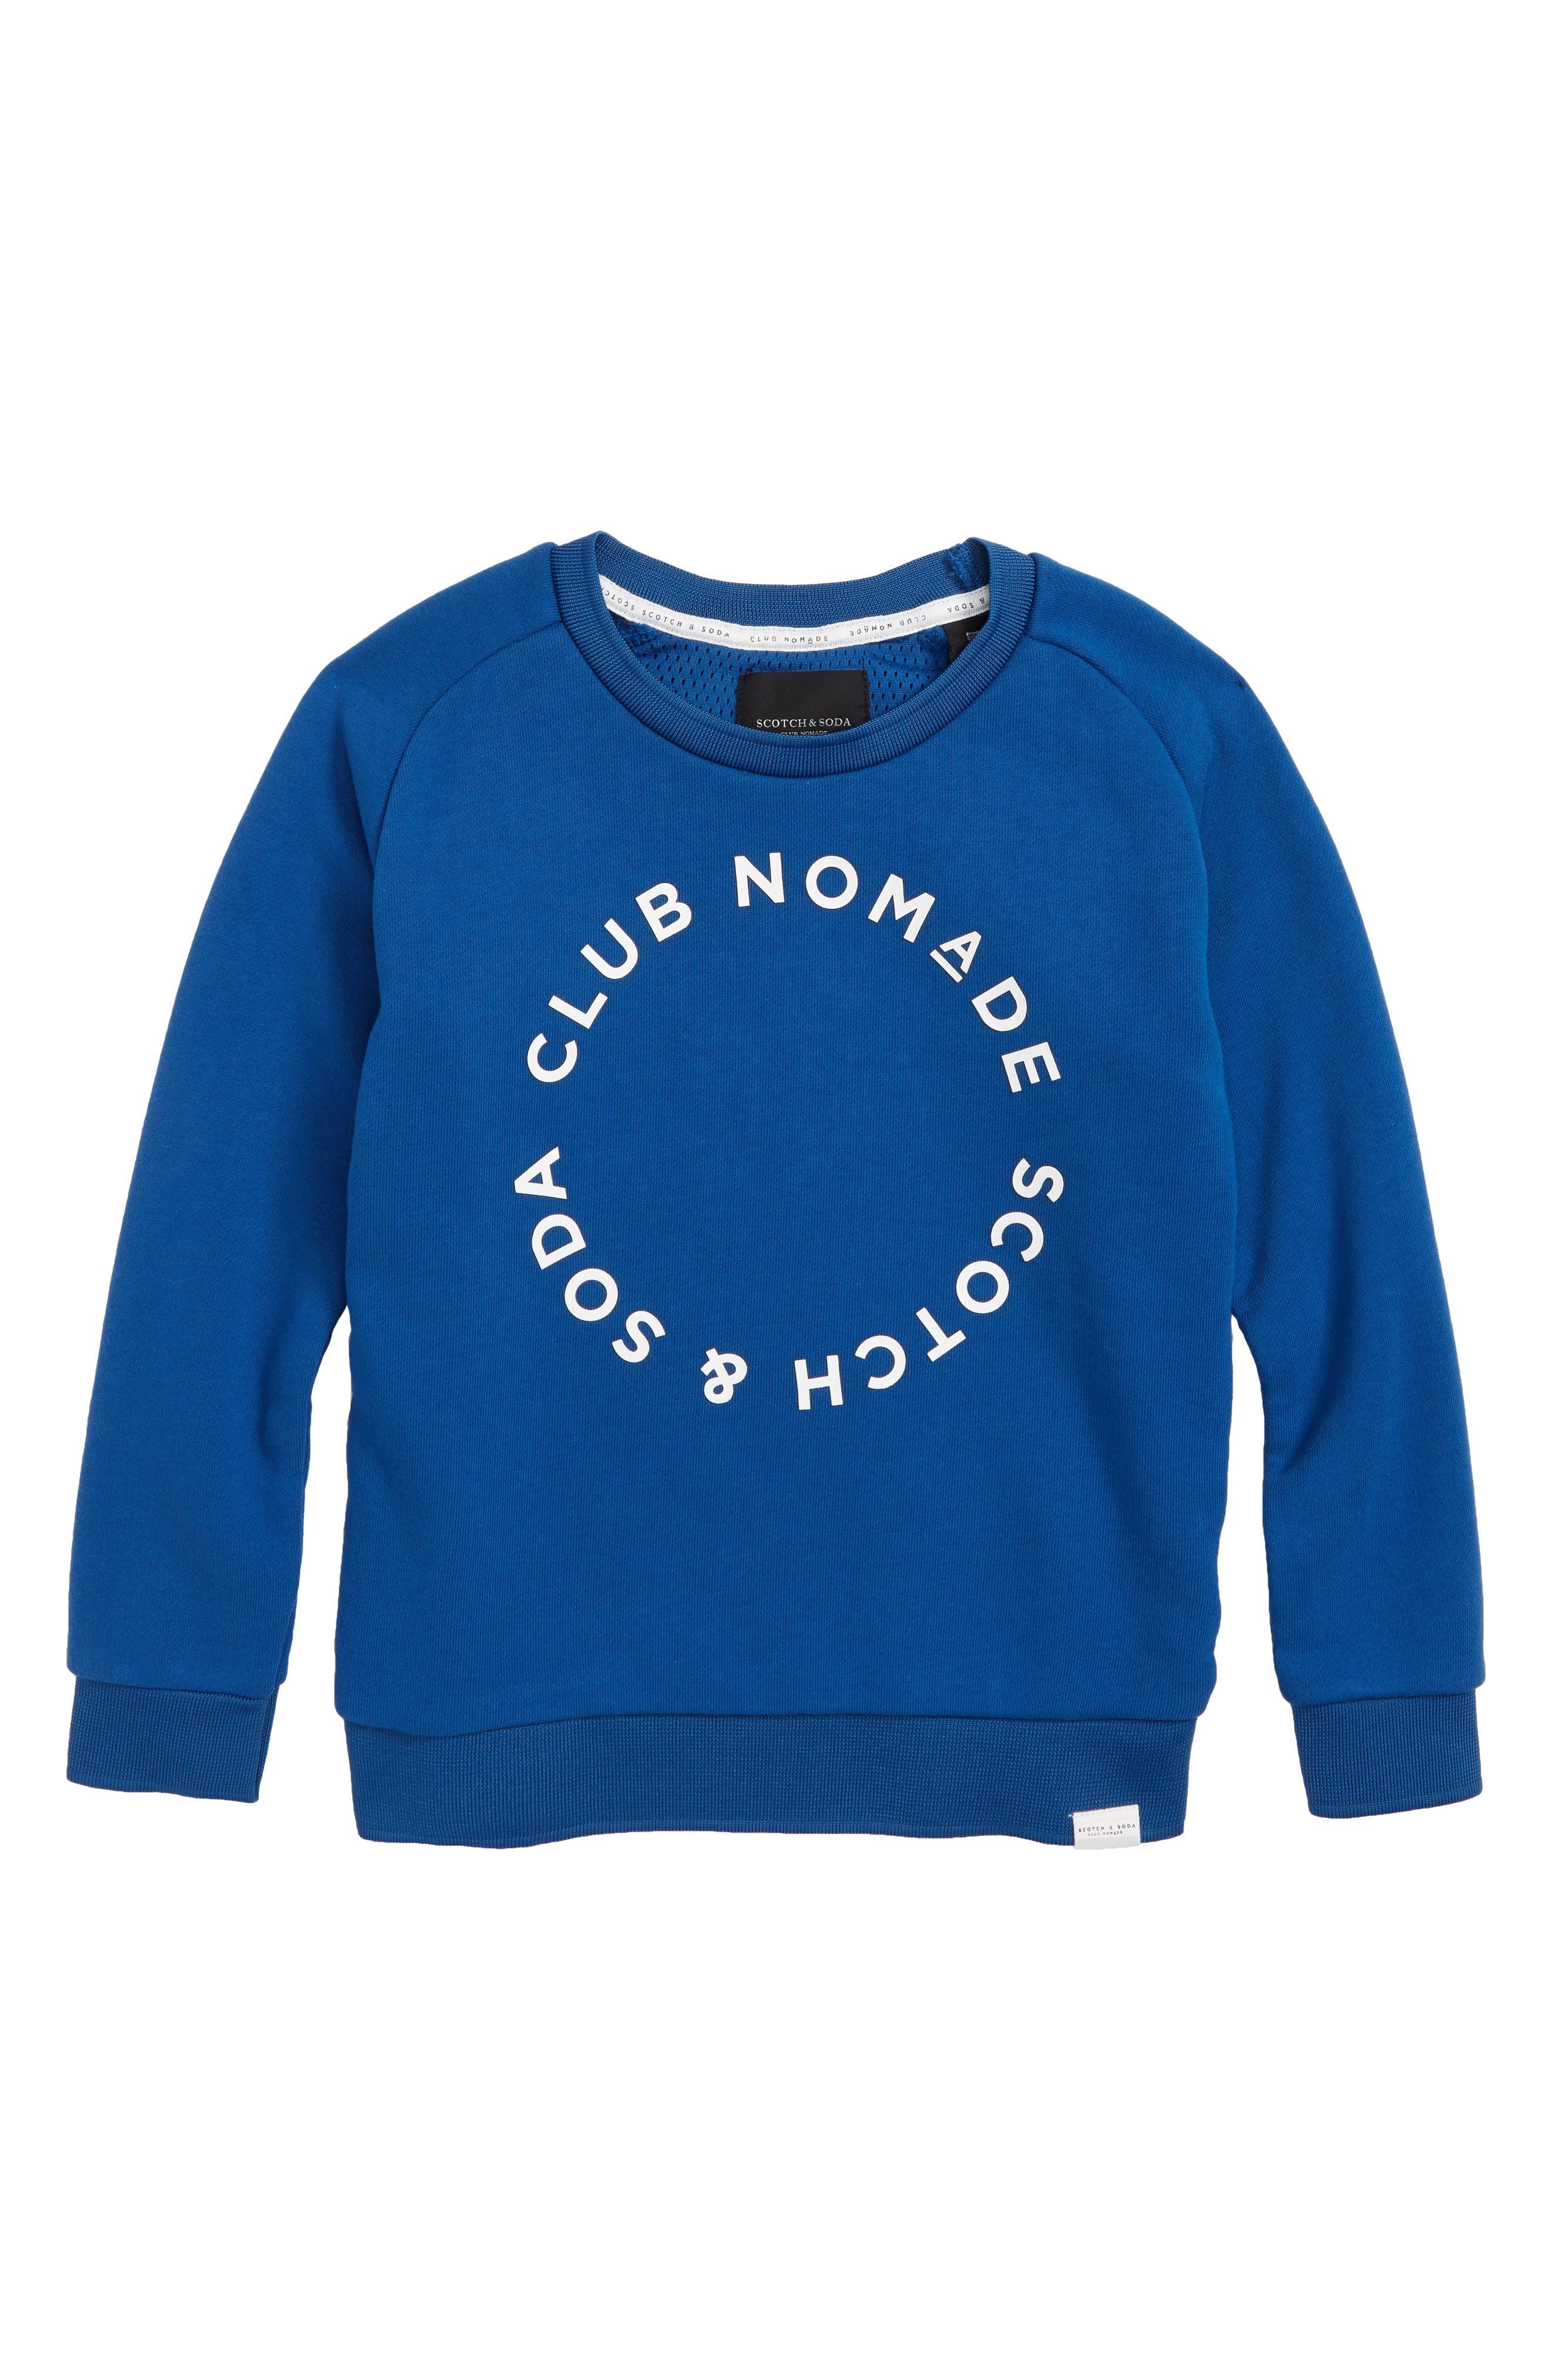 Club Nomad Sweatshirt,                             Main thumbnail 1, color,                             400